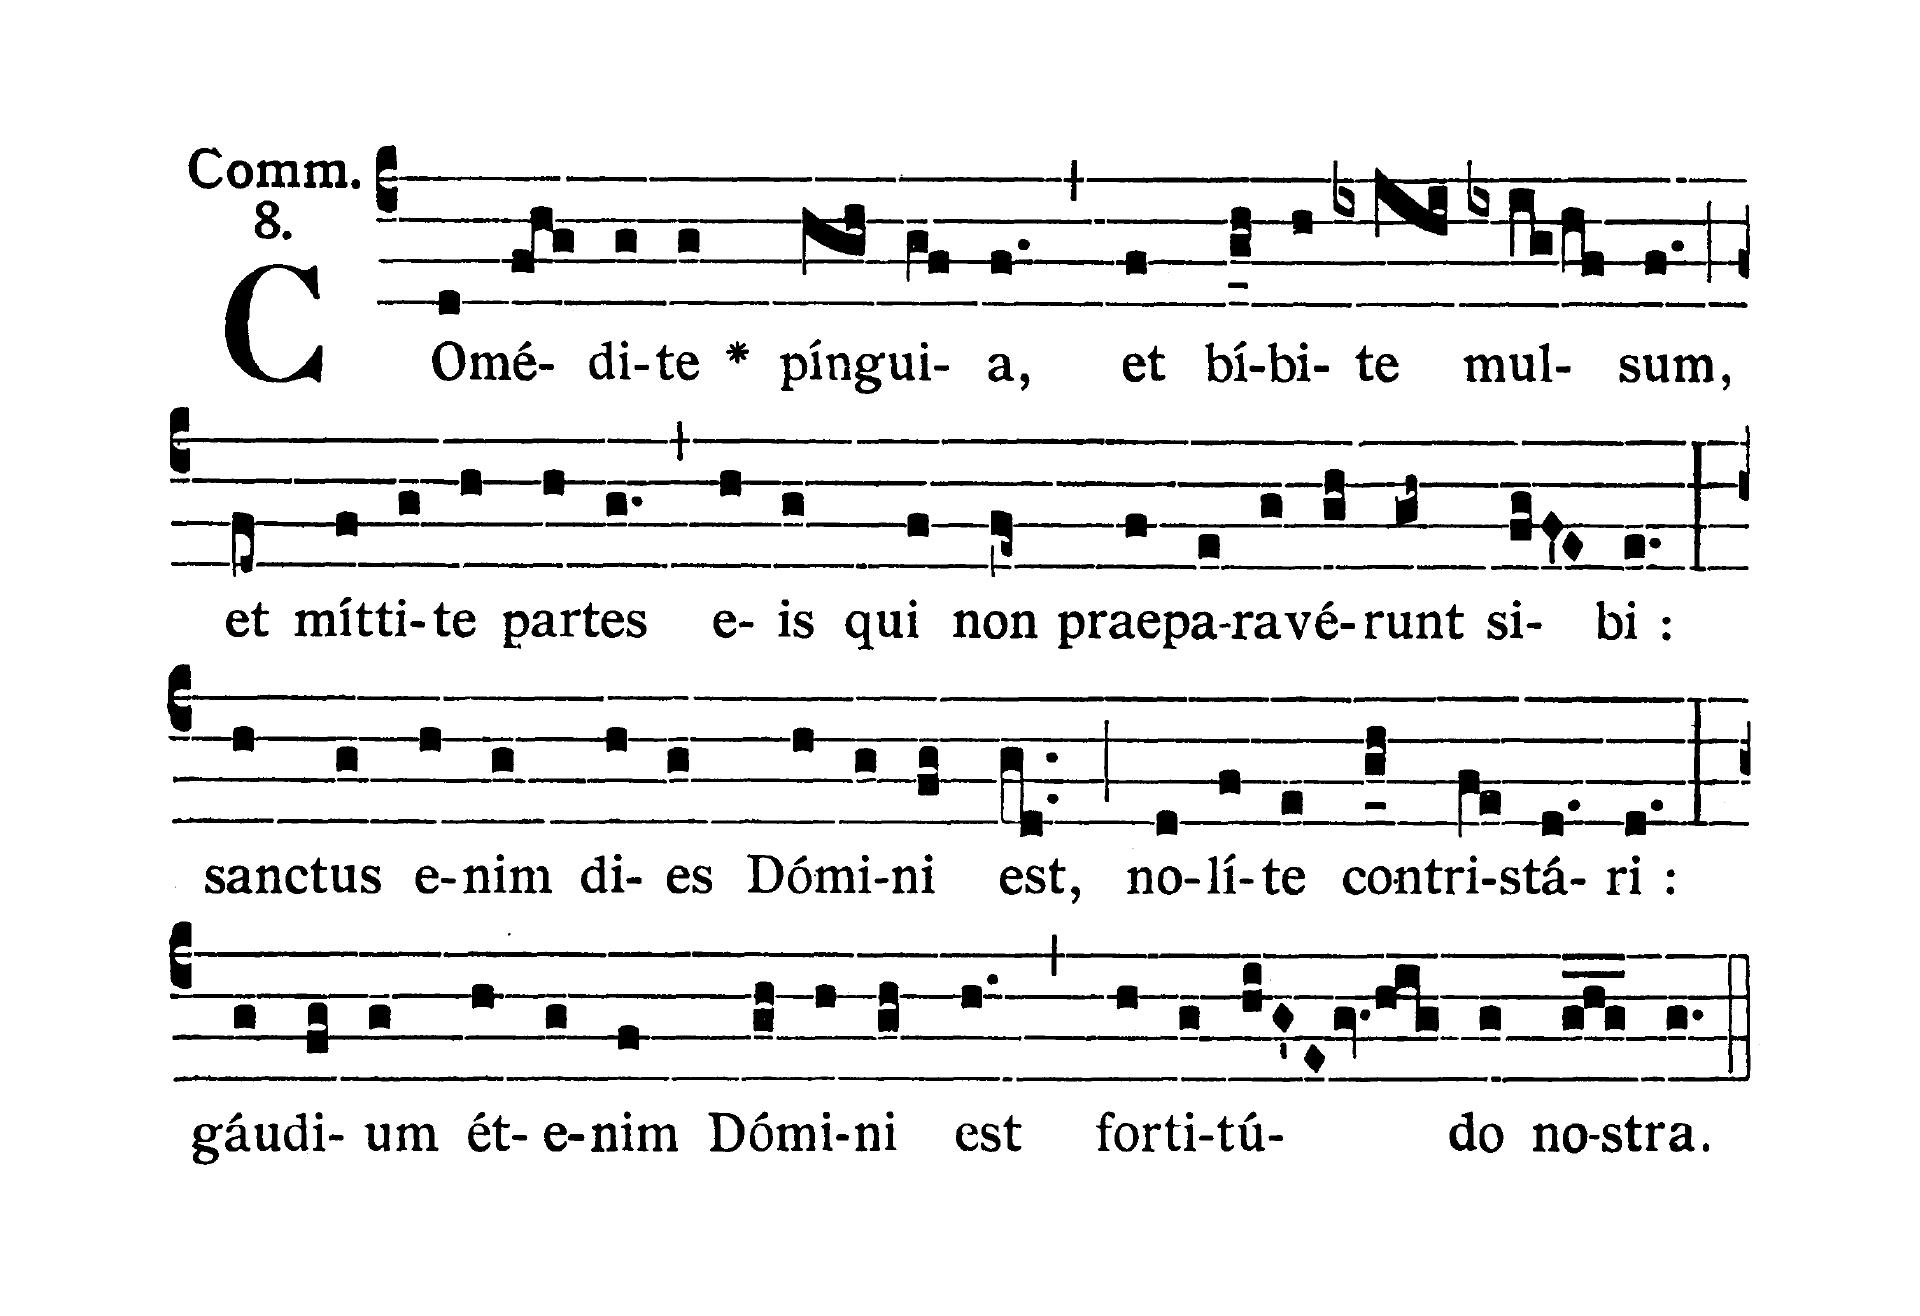 Feria VI Quatuor Temporum Septembris (Piątek suchych dni wrześniowych) - Communio (Aufer a me)